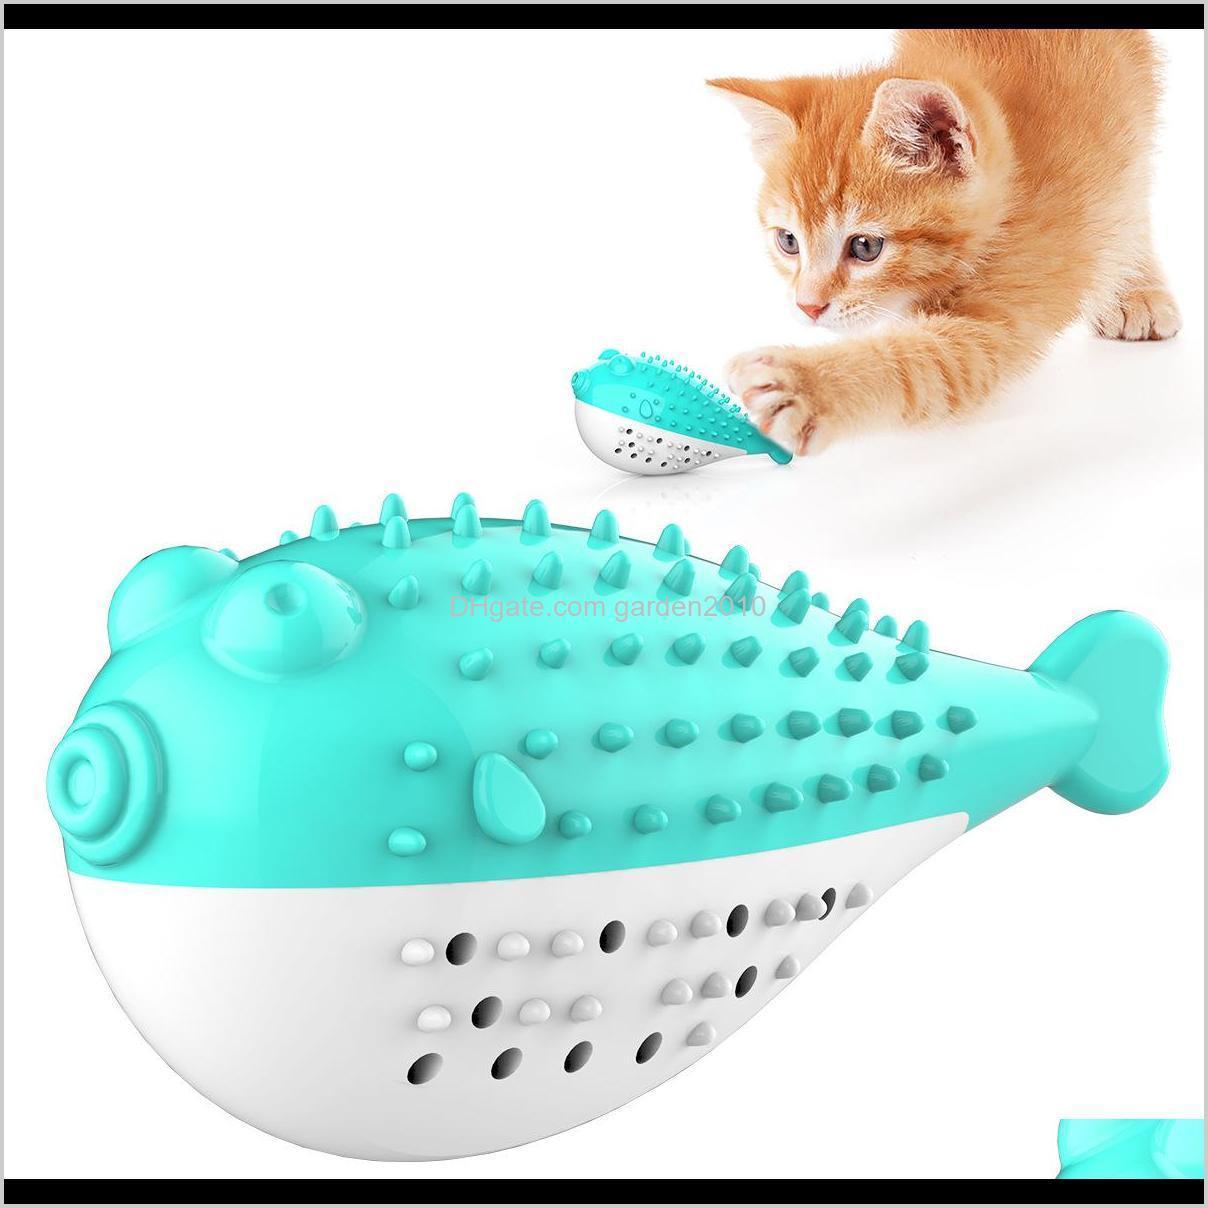 Dolphin Mint Odontoprisis Simulation Fish Catnip Clean Teethbrush Resistance To Bite Cat Toys Chews Dog Pet Supplies Ha291 3Pjdm Ayvsu